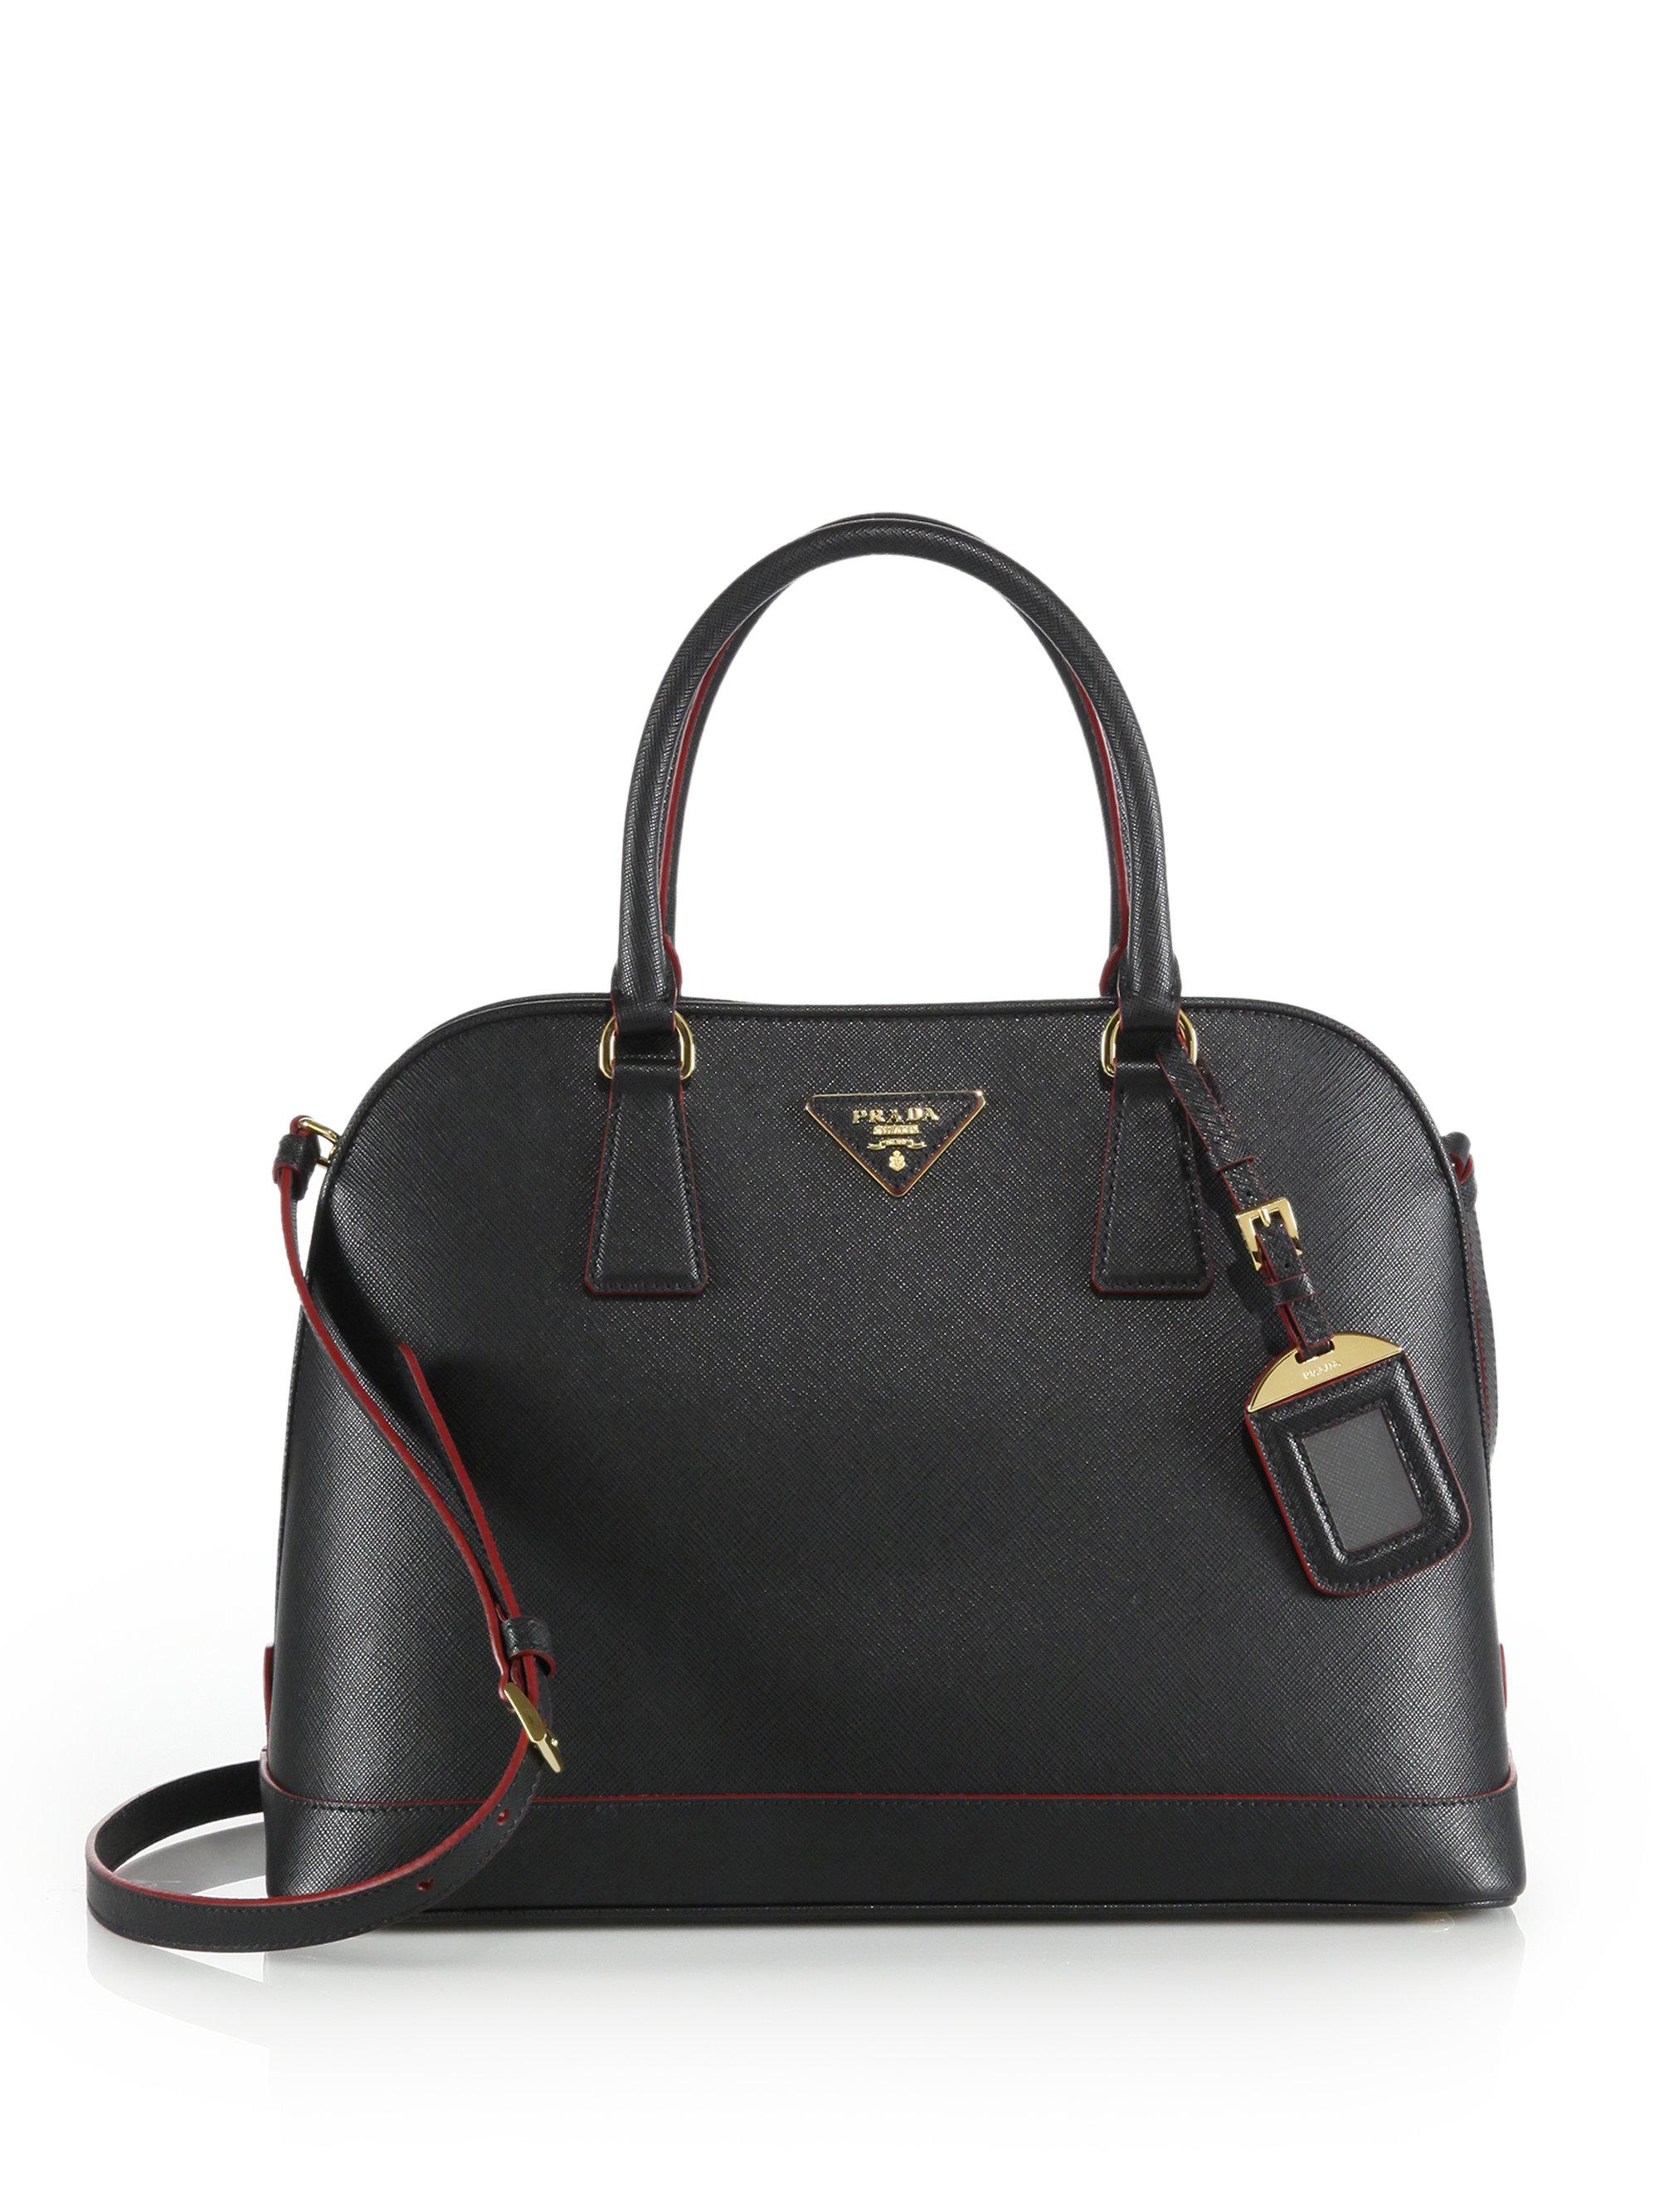 Prada Leather Satchel Prada Multicolor Handbag